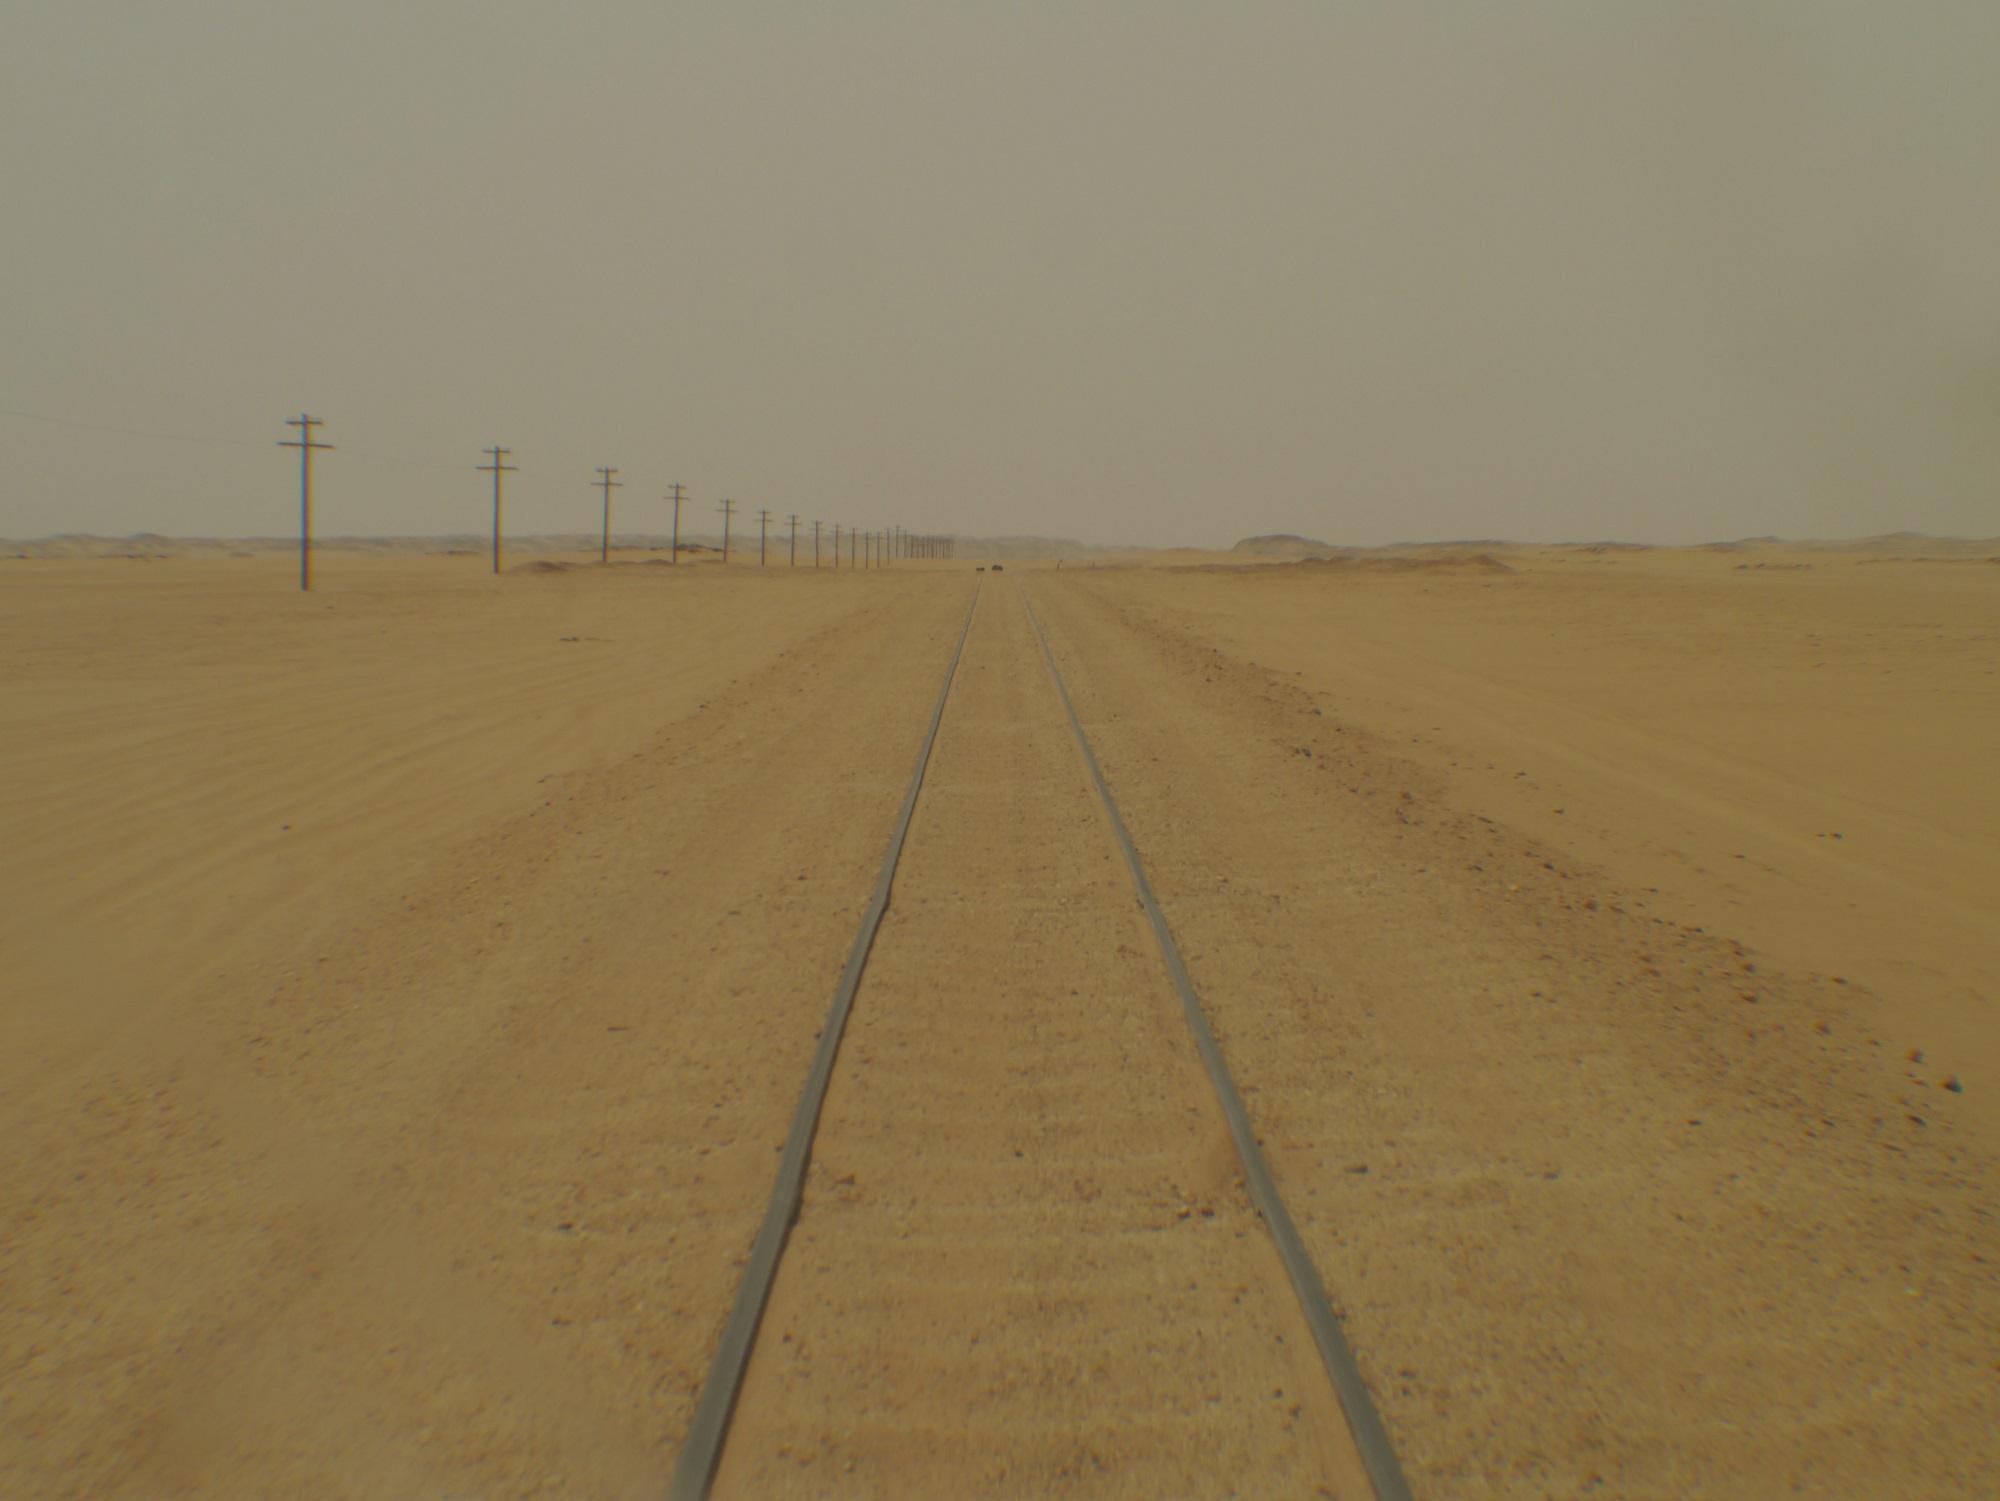 2014-CMCPHERSON-SUDAN-52